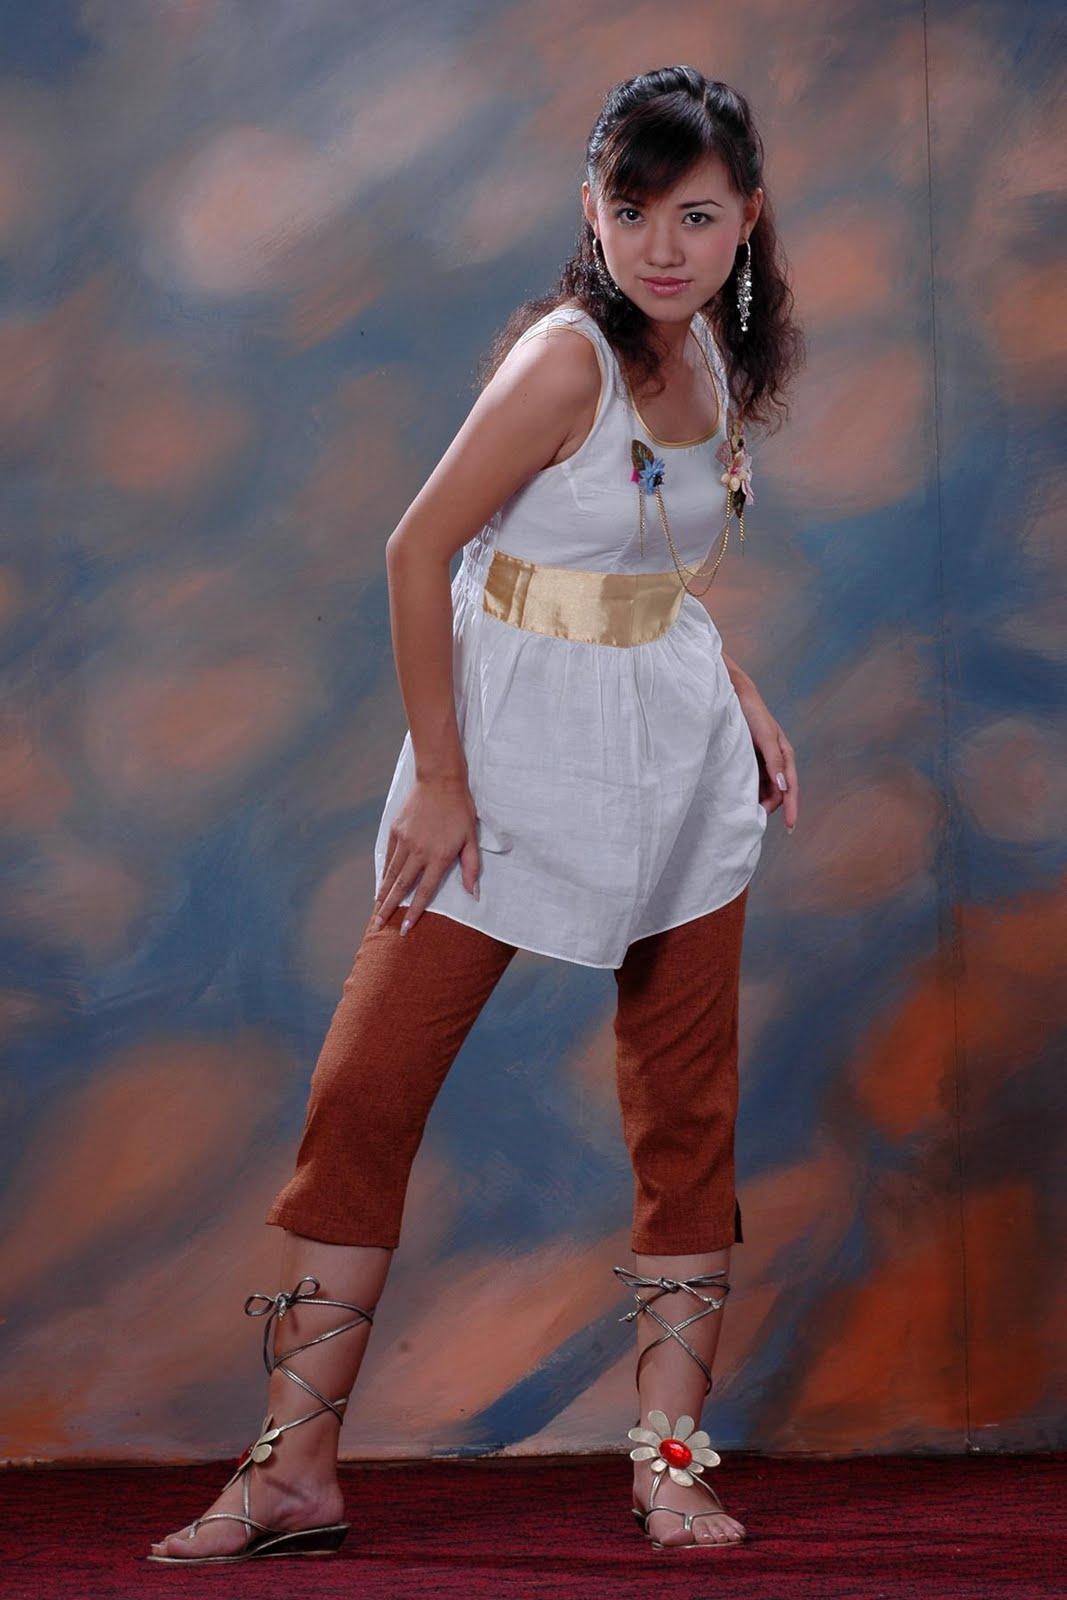 Myanmar Model, Ei Phyo Cherrys Colorful Fashion Photos